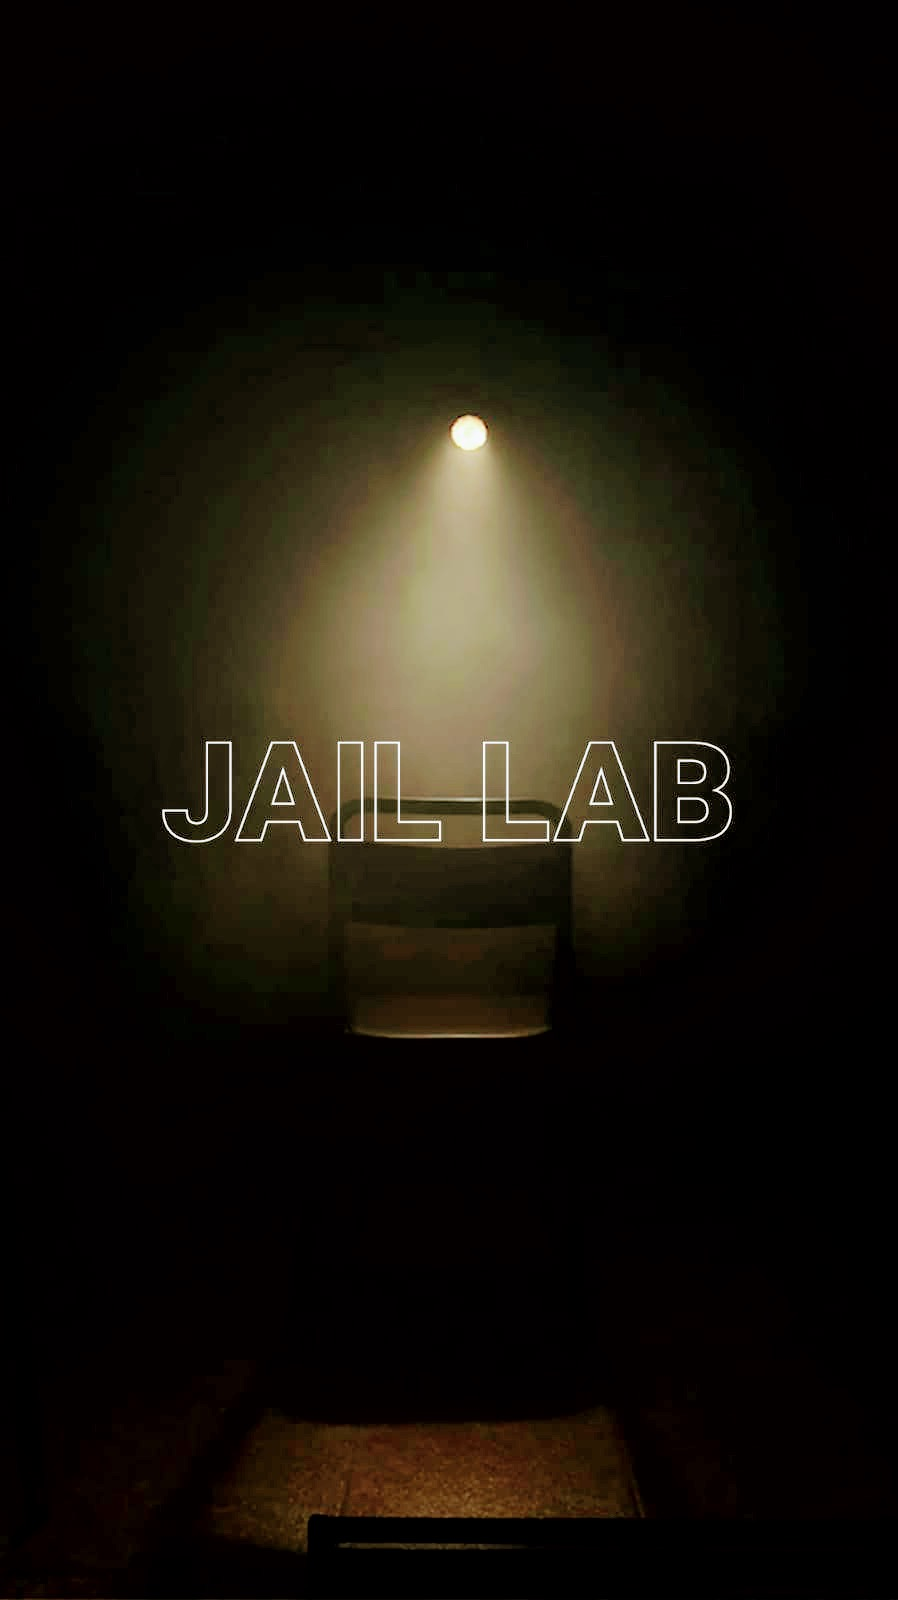 jail lab us barcelona